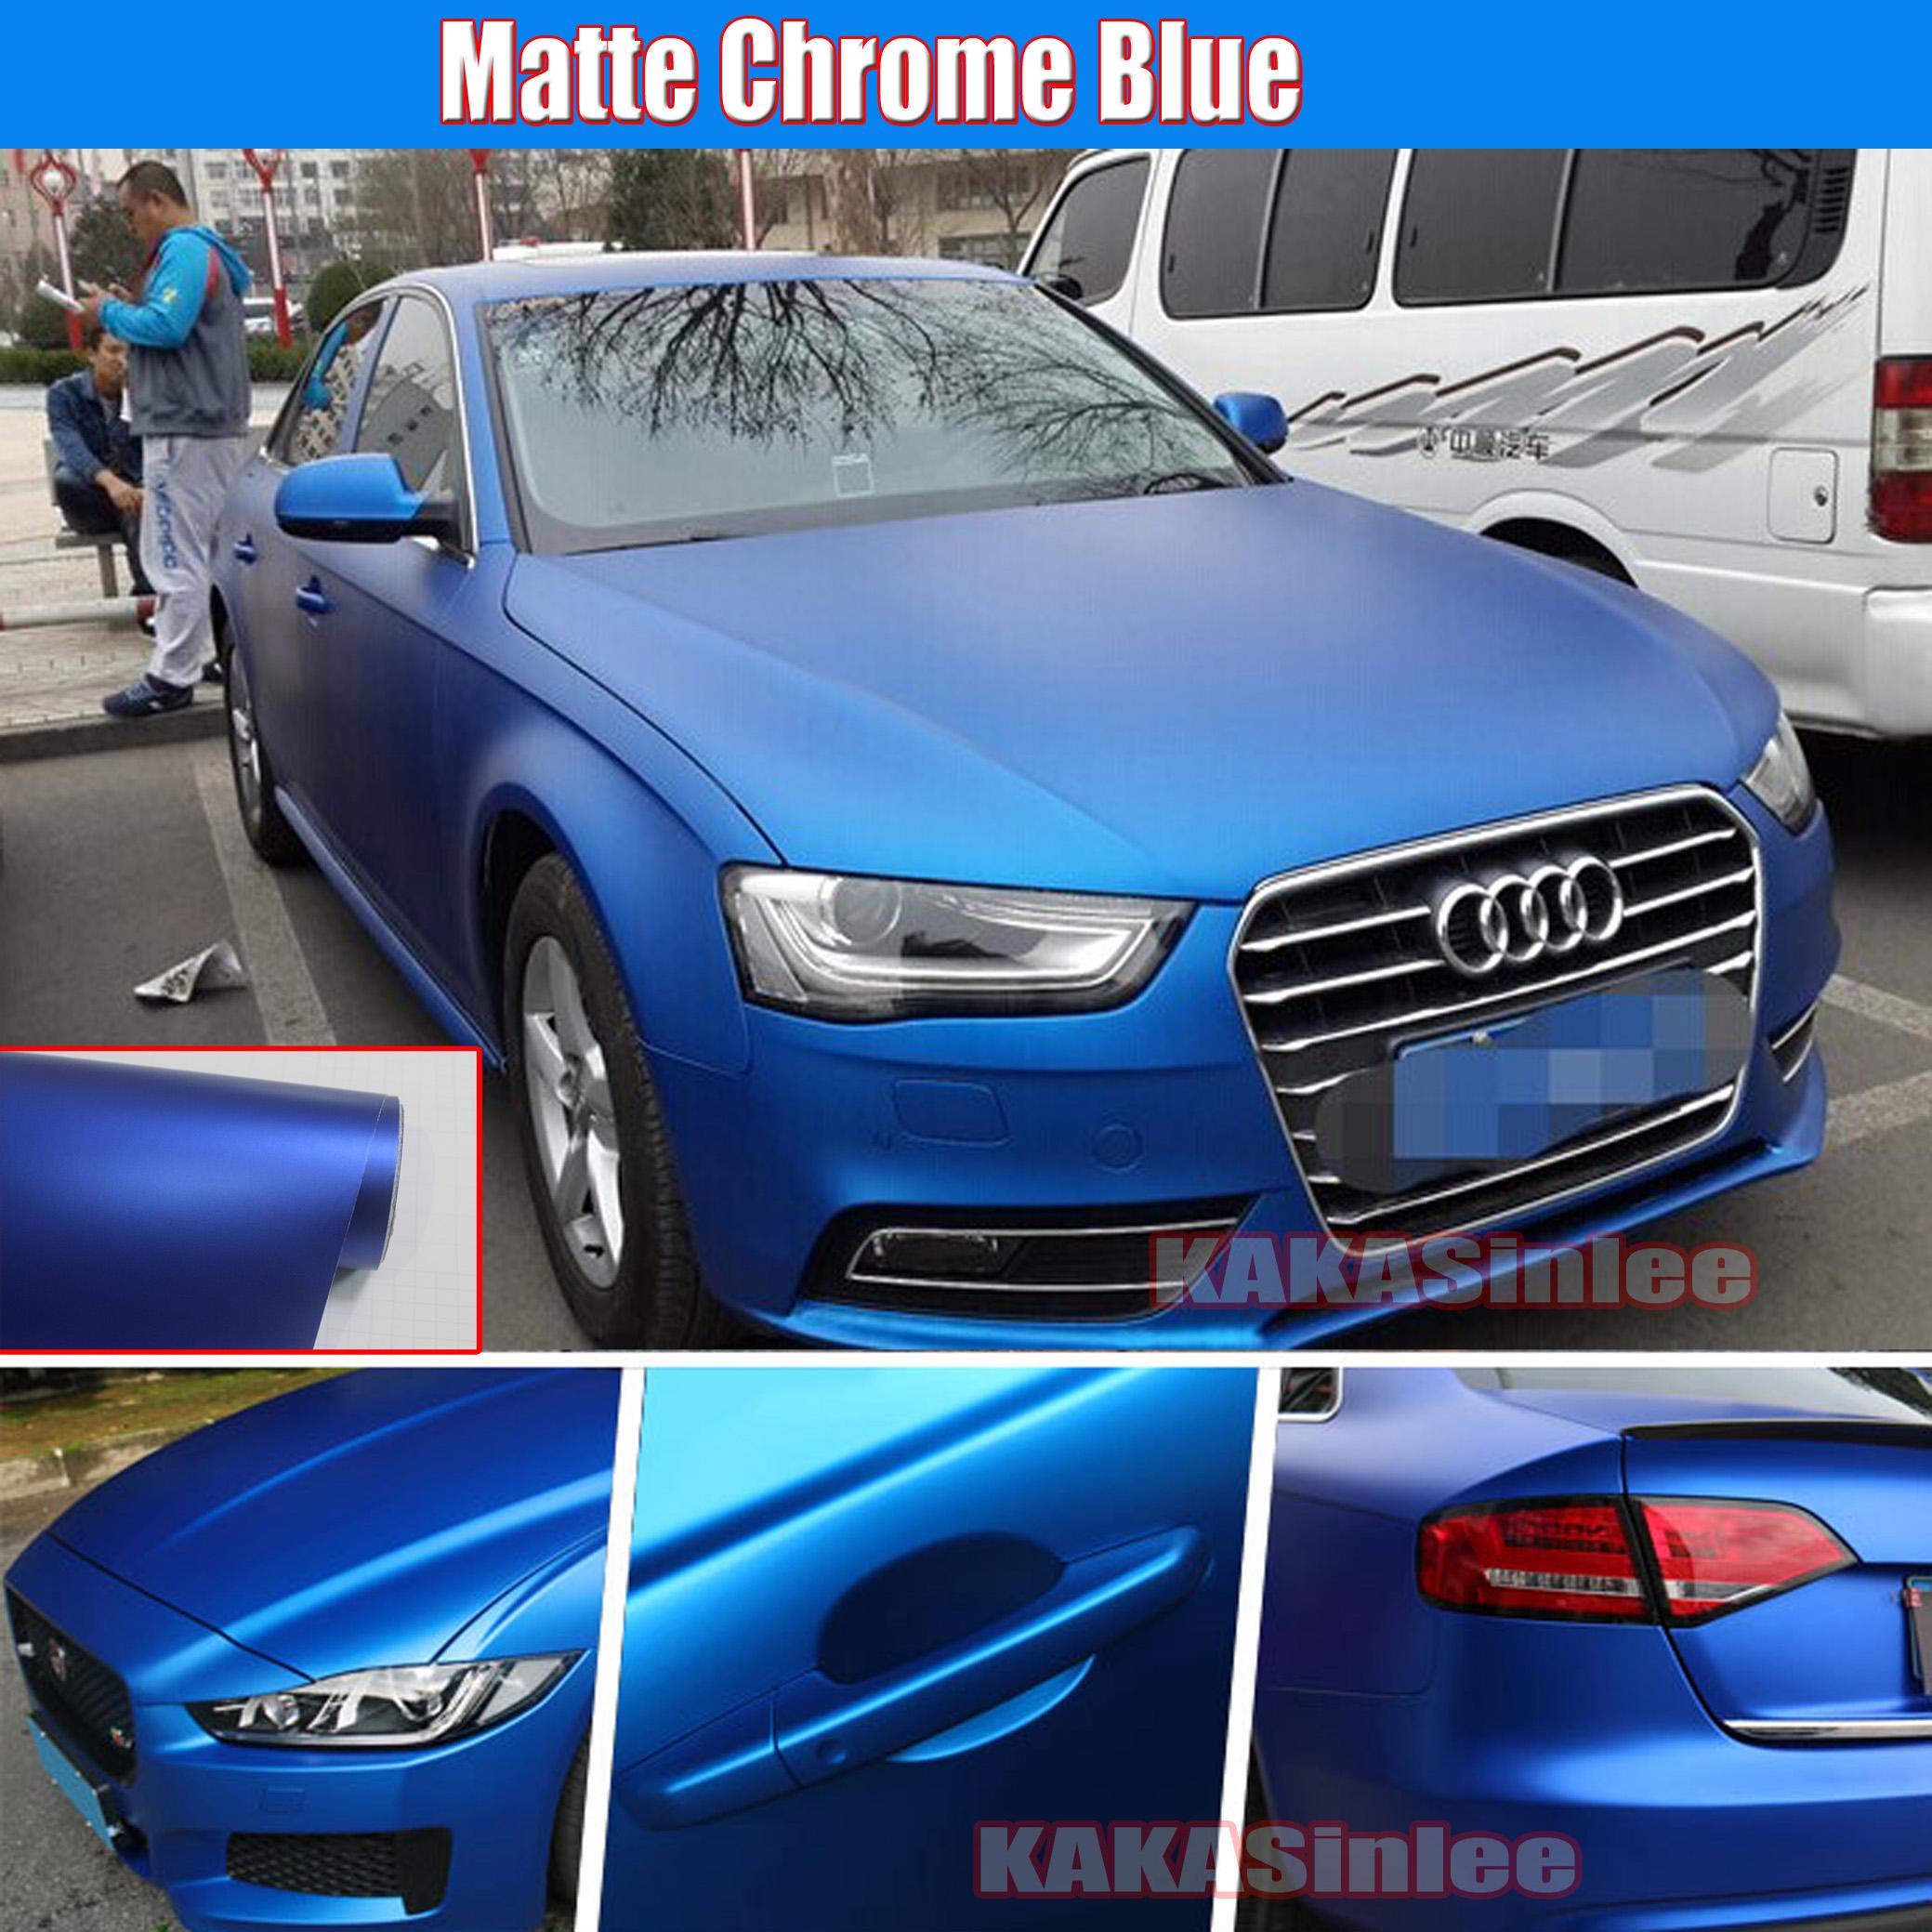 Matte Blue Car >> Details About 12 X 60 Cool Car Wrap Metallic Satin Matte Metal Chrome Vinyl Sticker Blue Hd